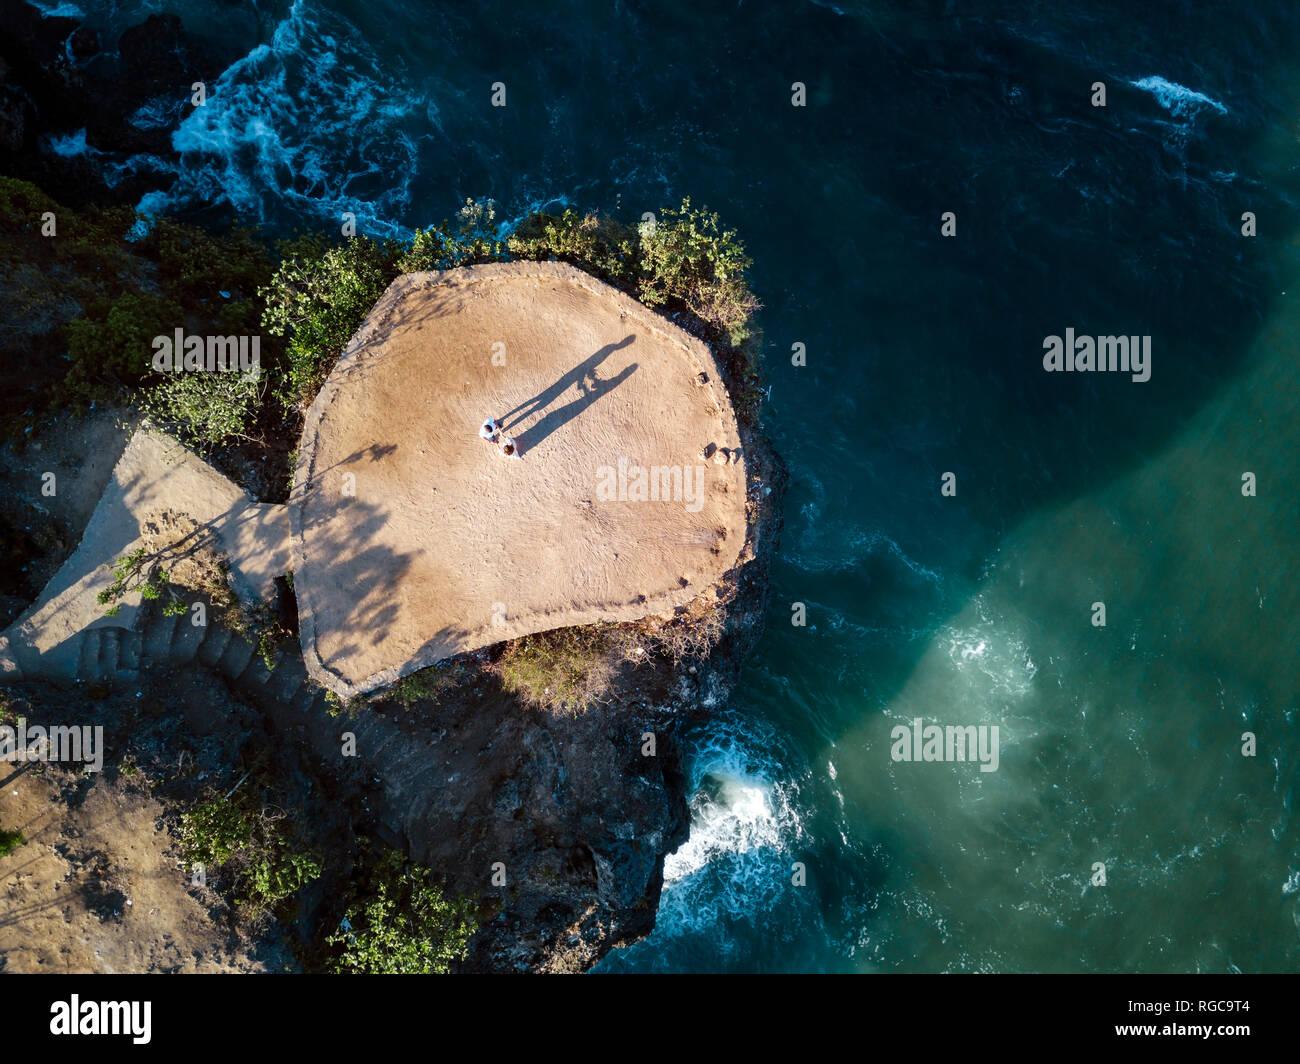 Indonesia, Bali, Aerial view of viewpoint at Balangan beach - Stock Image